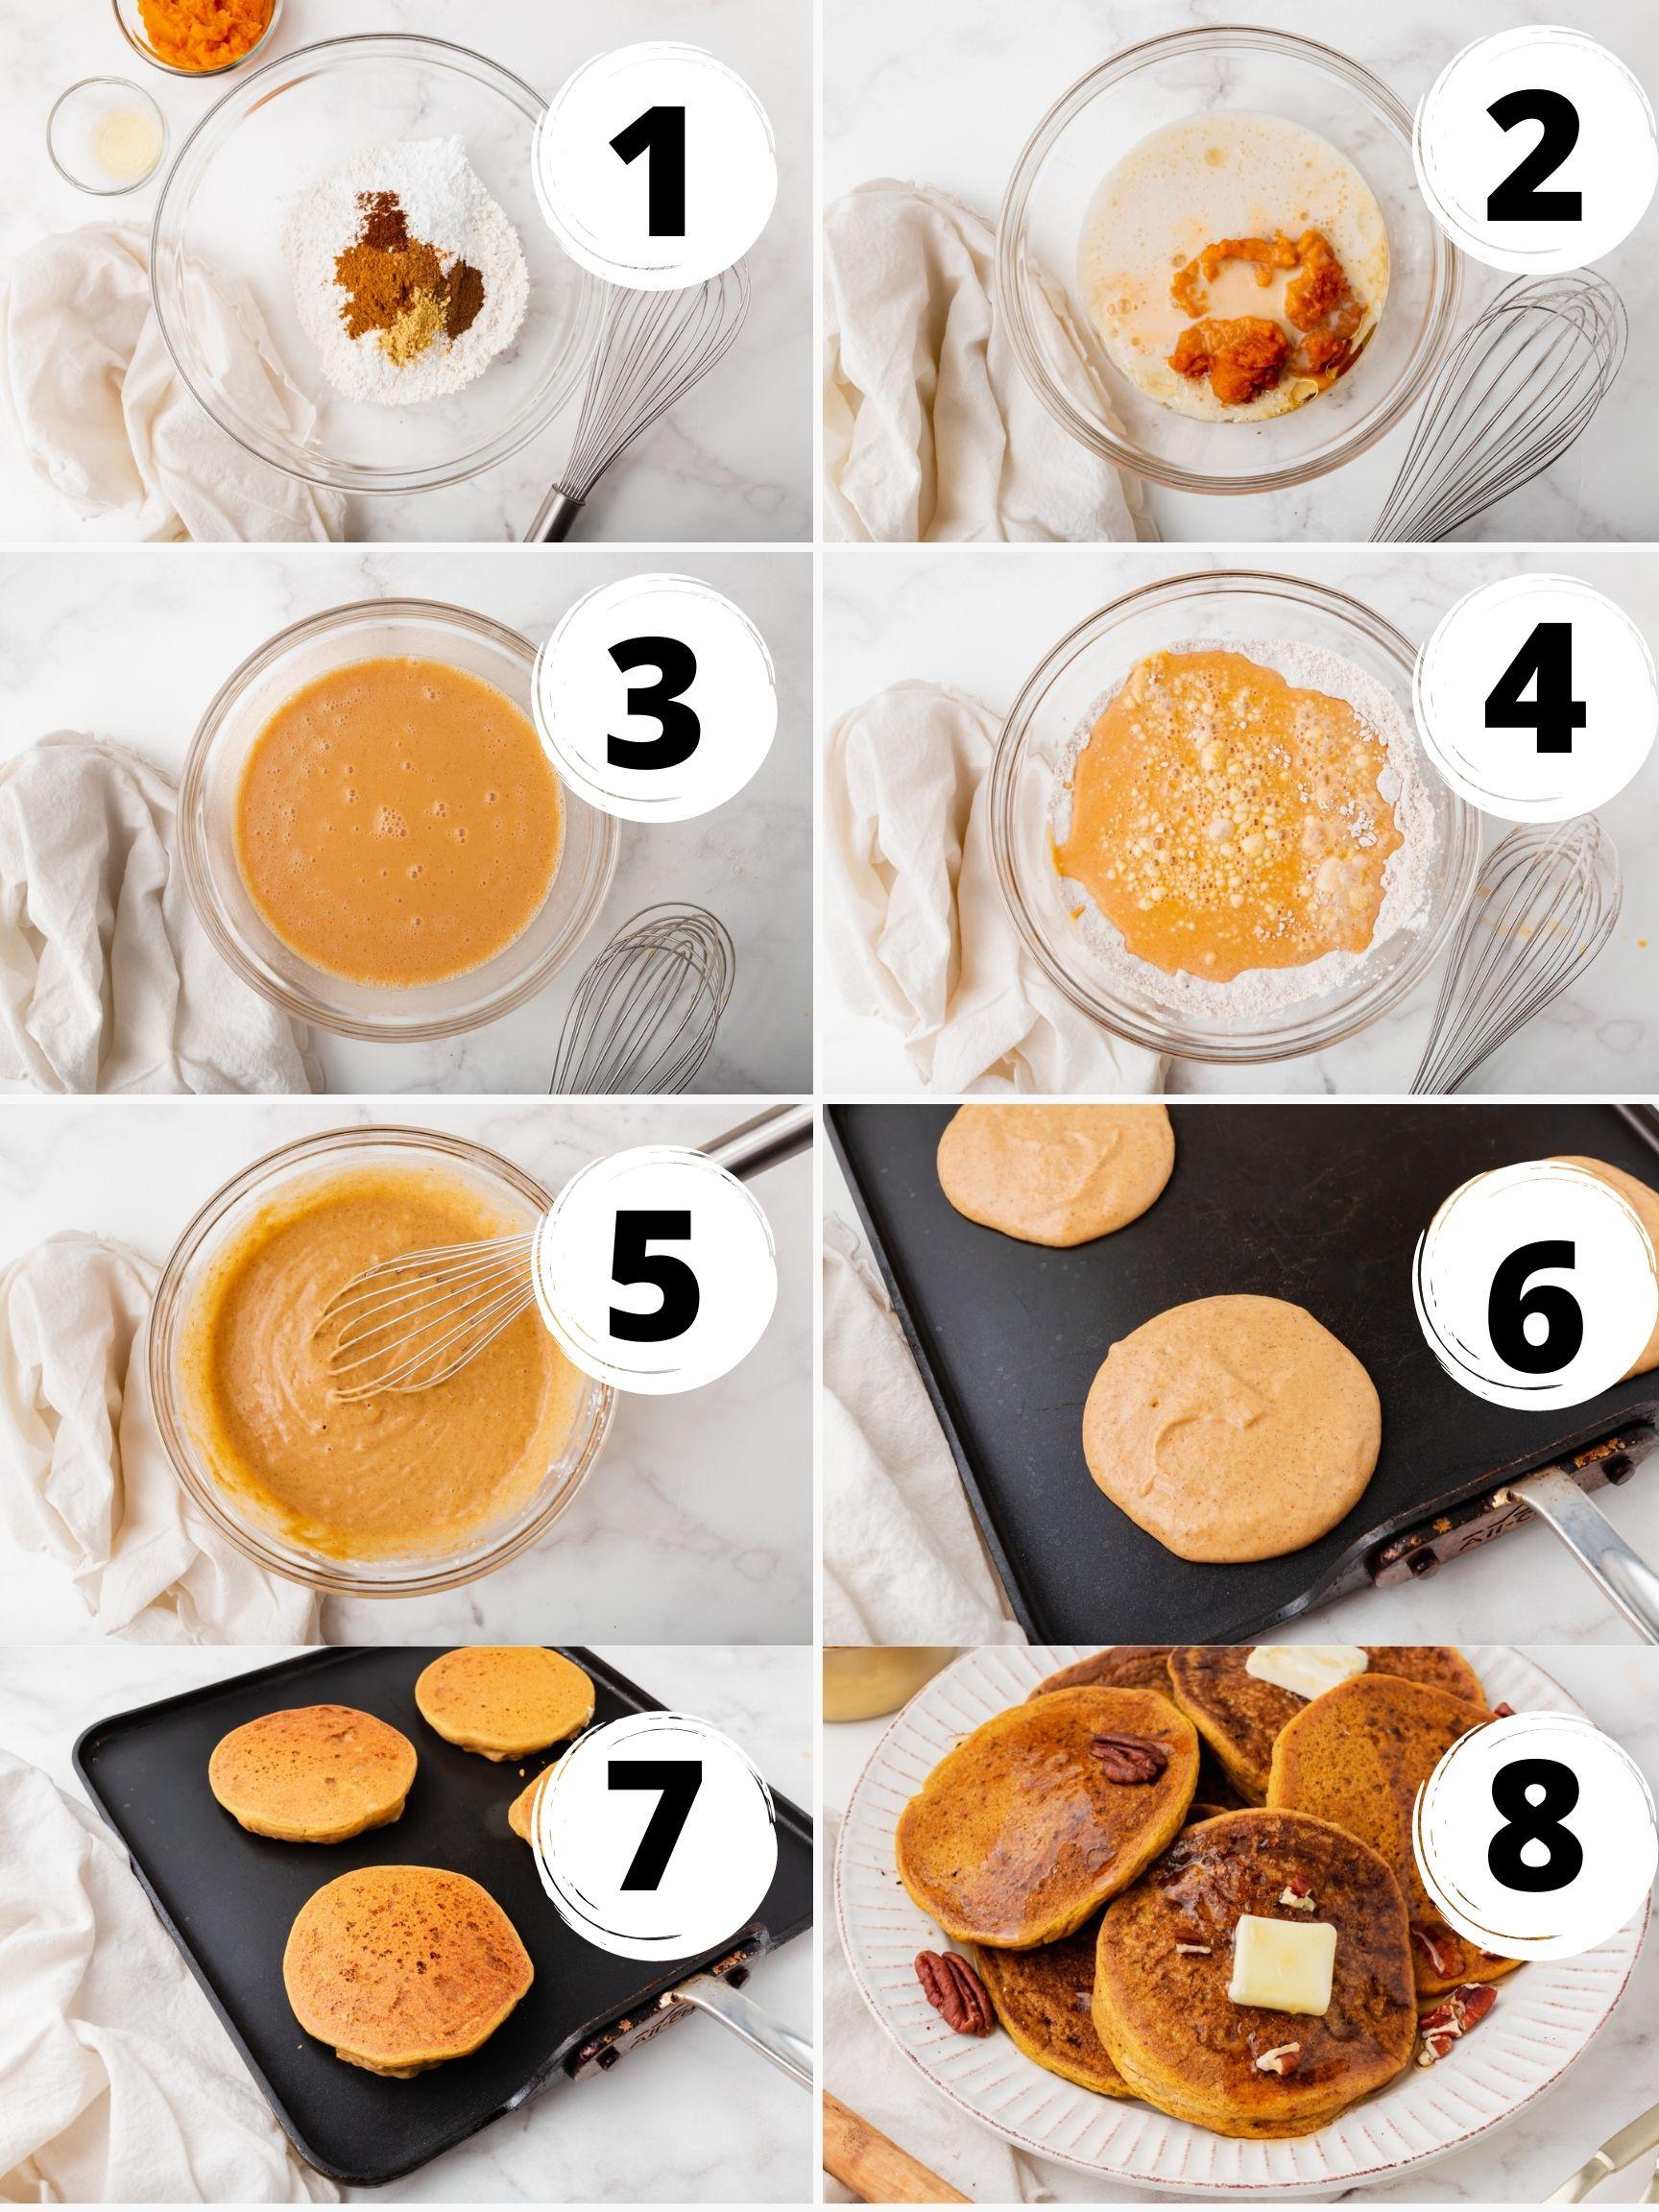 Collage of 8 steps to make vegan pumpkin pancakes on a griddle